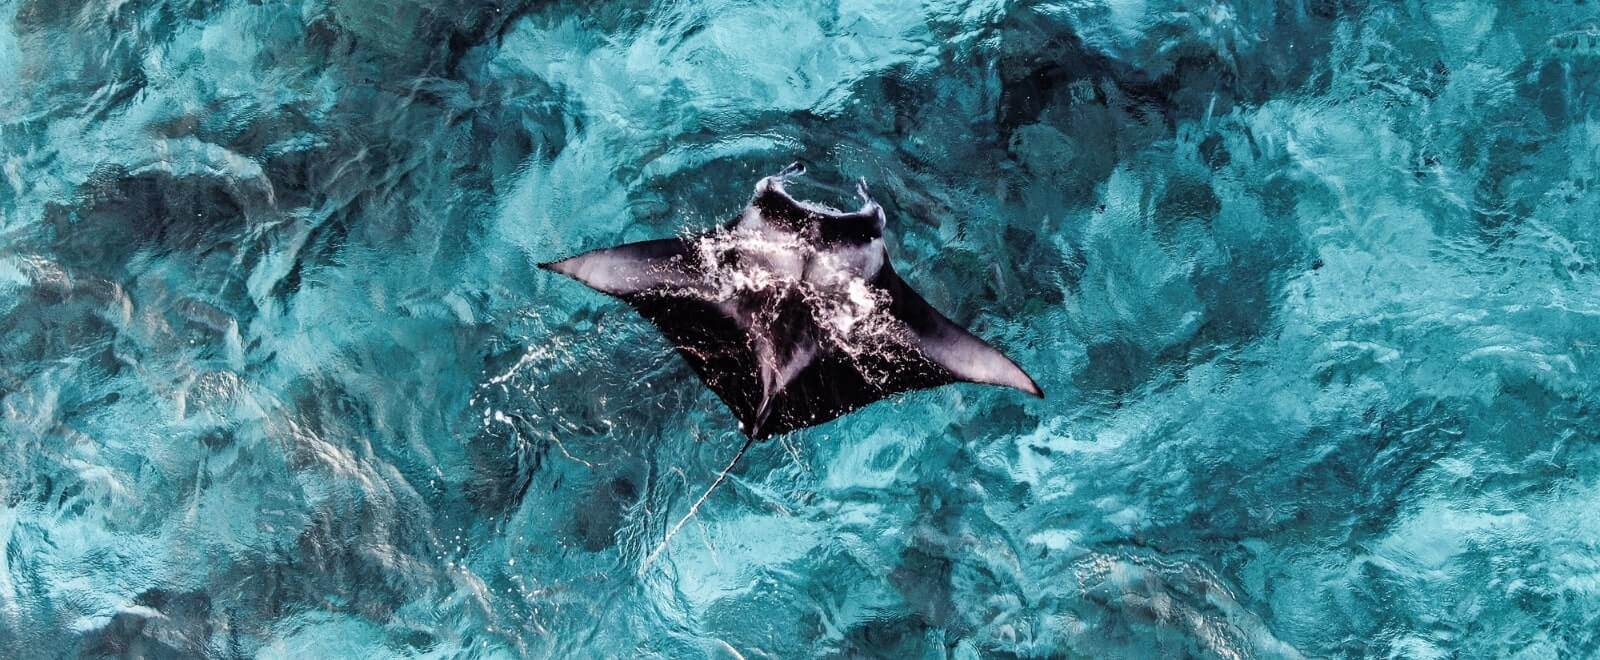 Stingray swimming aerial shot